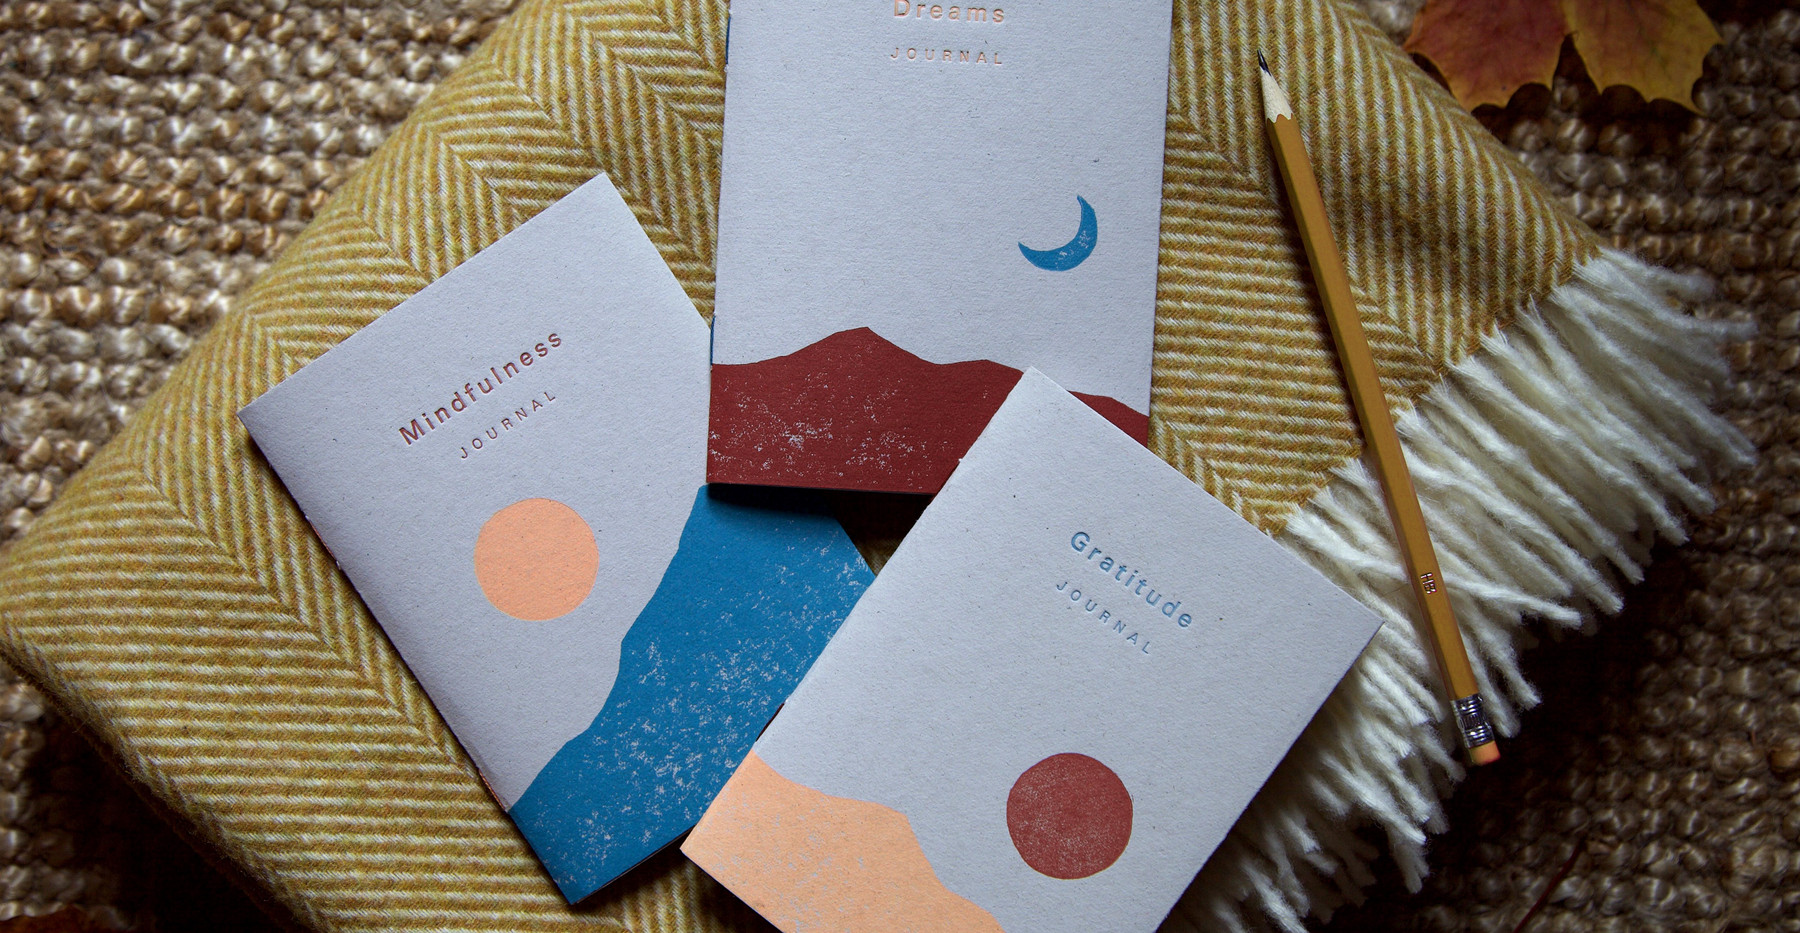 Linocut_Letterpress_Mountains_Journals_Hannah_Farthing